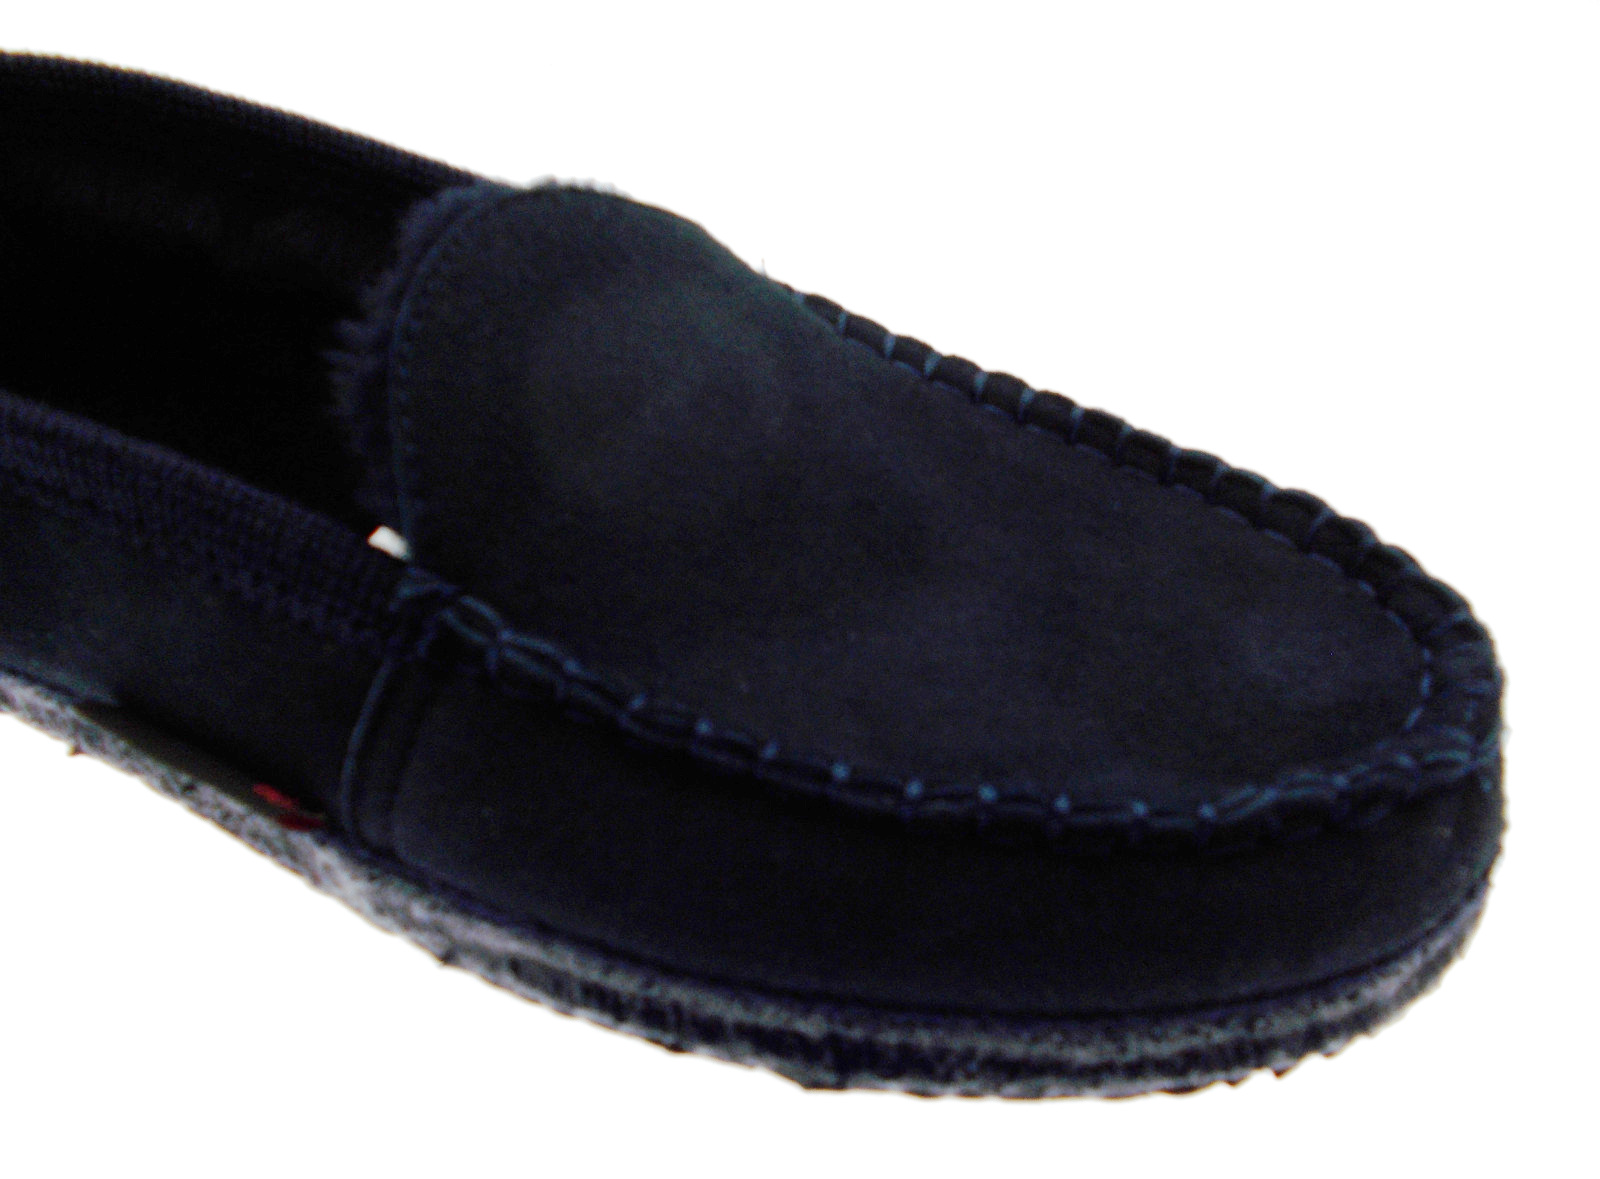 66 Mocassino Dark 10 47129 Pantofola Giesswein Mutzel 588 Blue PawPrqZXx